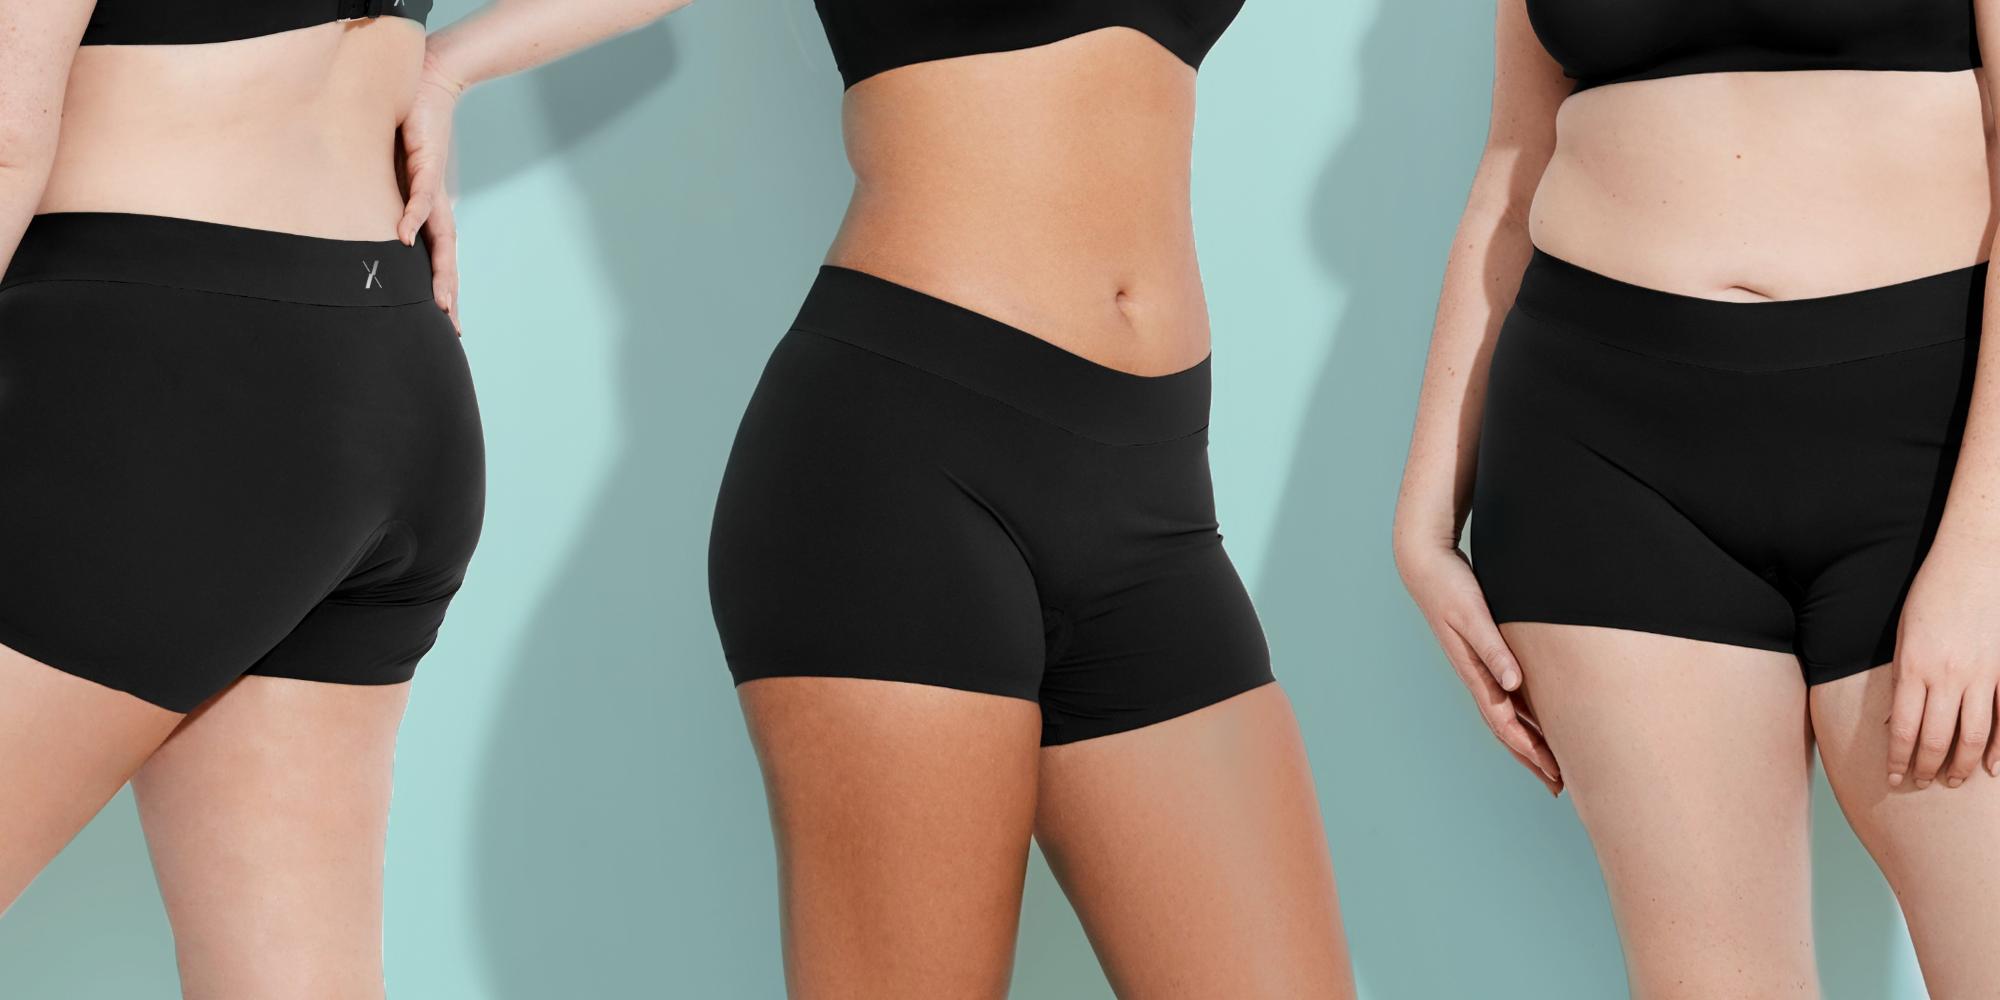 6 Best Period Panties to Buy in 2019 - How Period Underwear